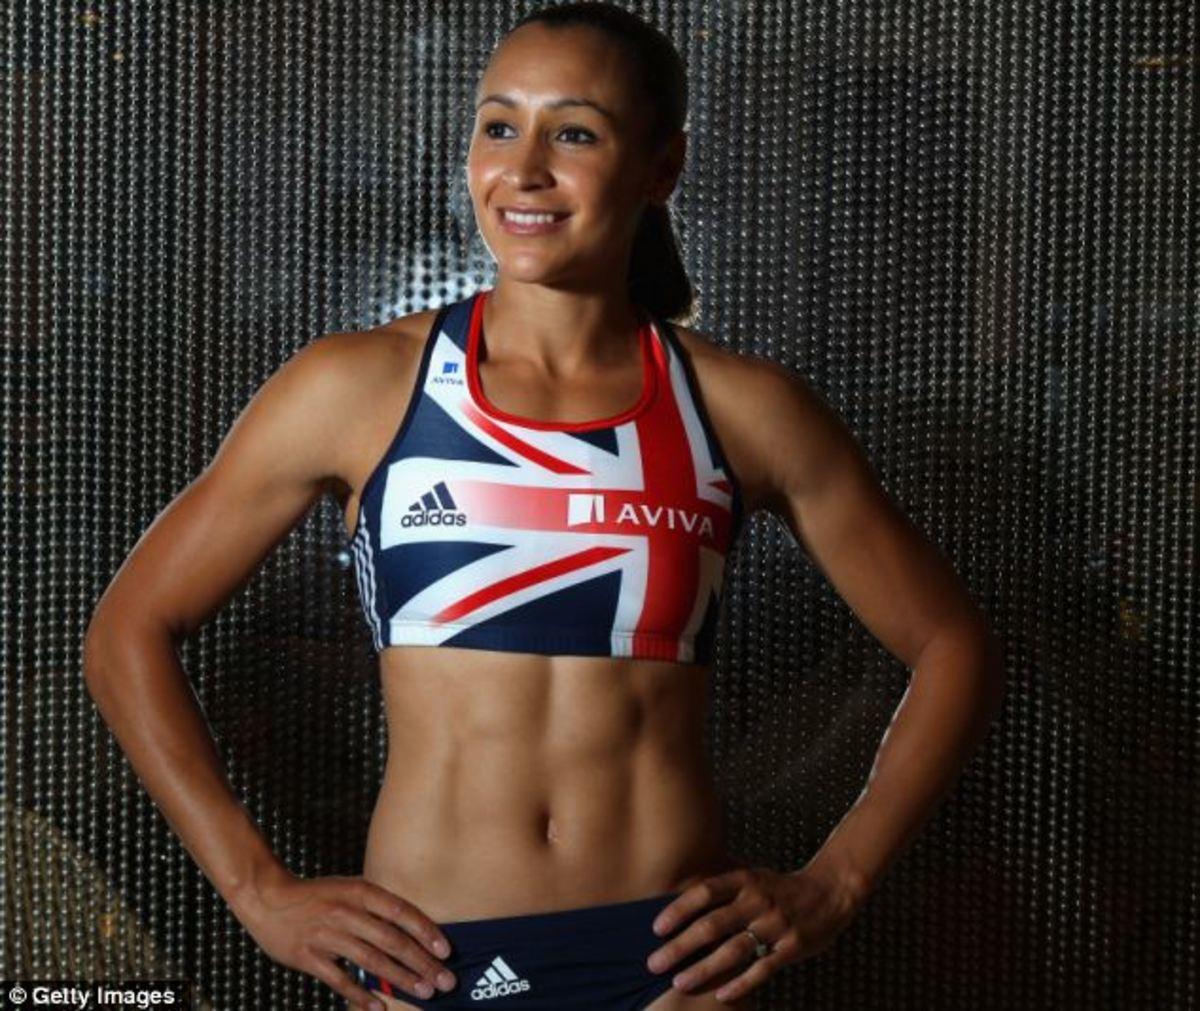 Jessica Ennis - Hot Female Olympian Body